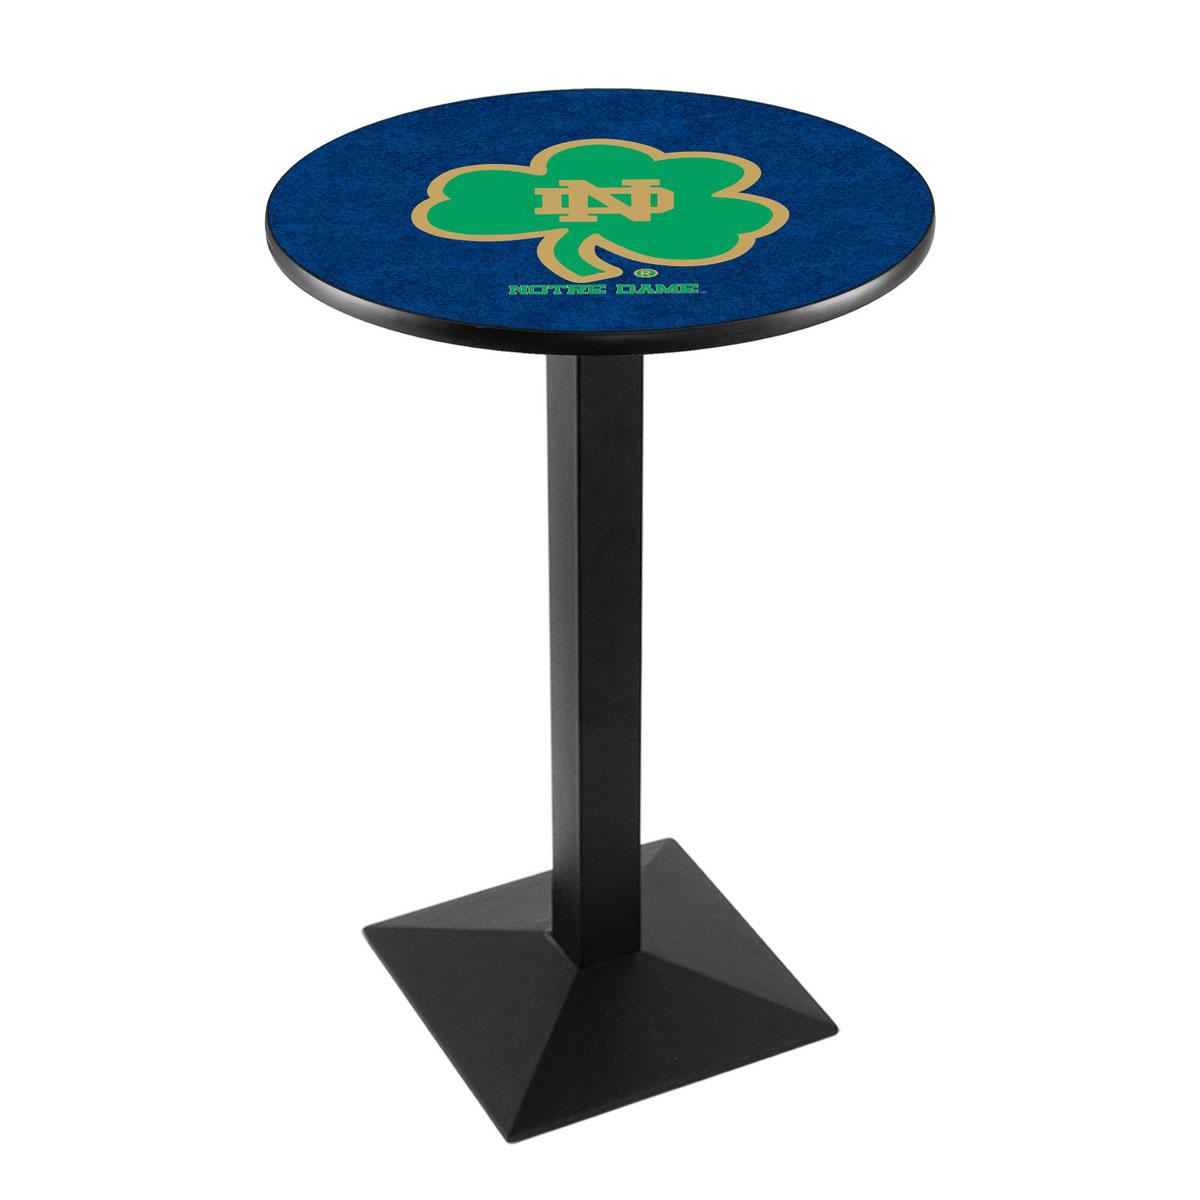 Money saving Notre Dame Shamrock Logo Pub Bar Table Square Stand Product Photo